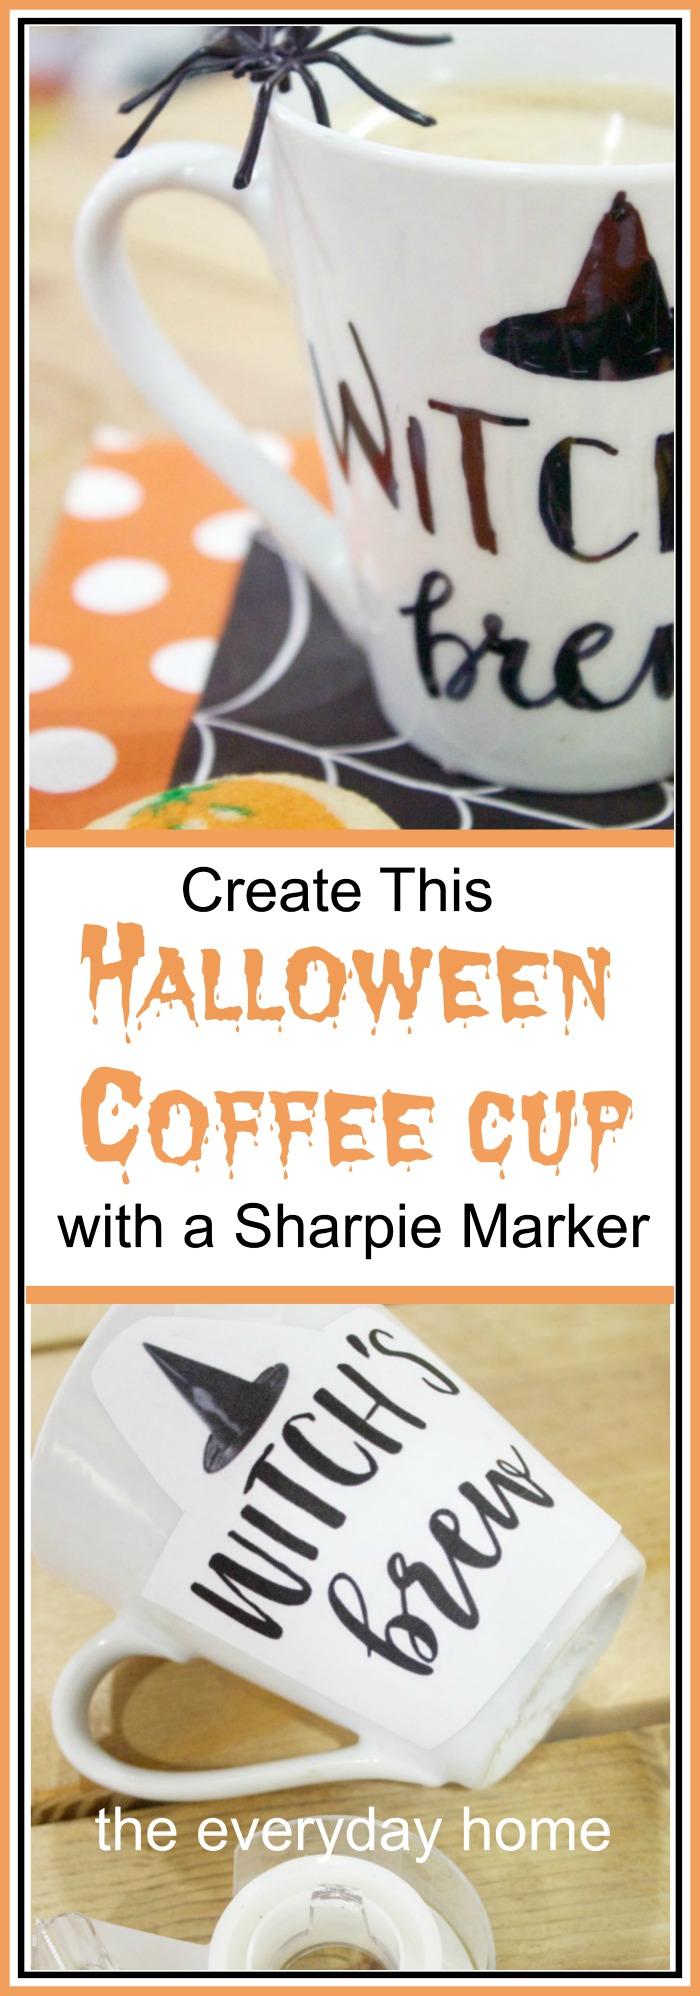 How to Create a Custom DIY Halloween Cup | The Everyday Home